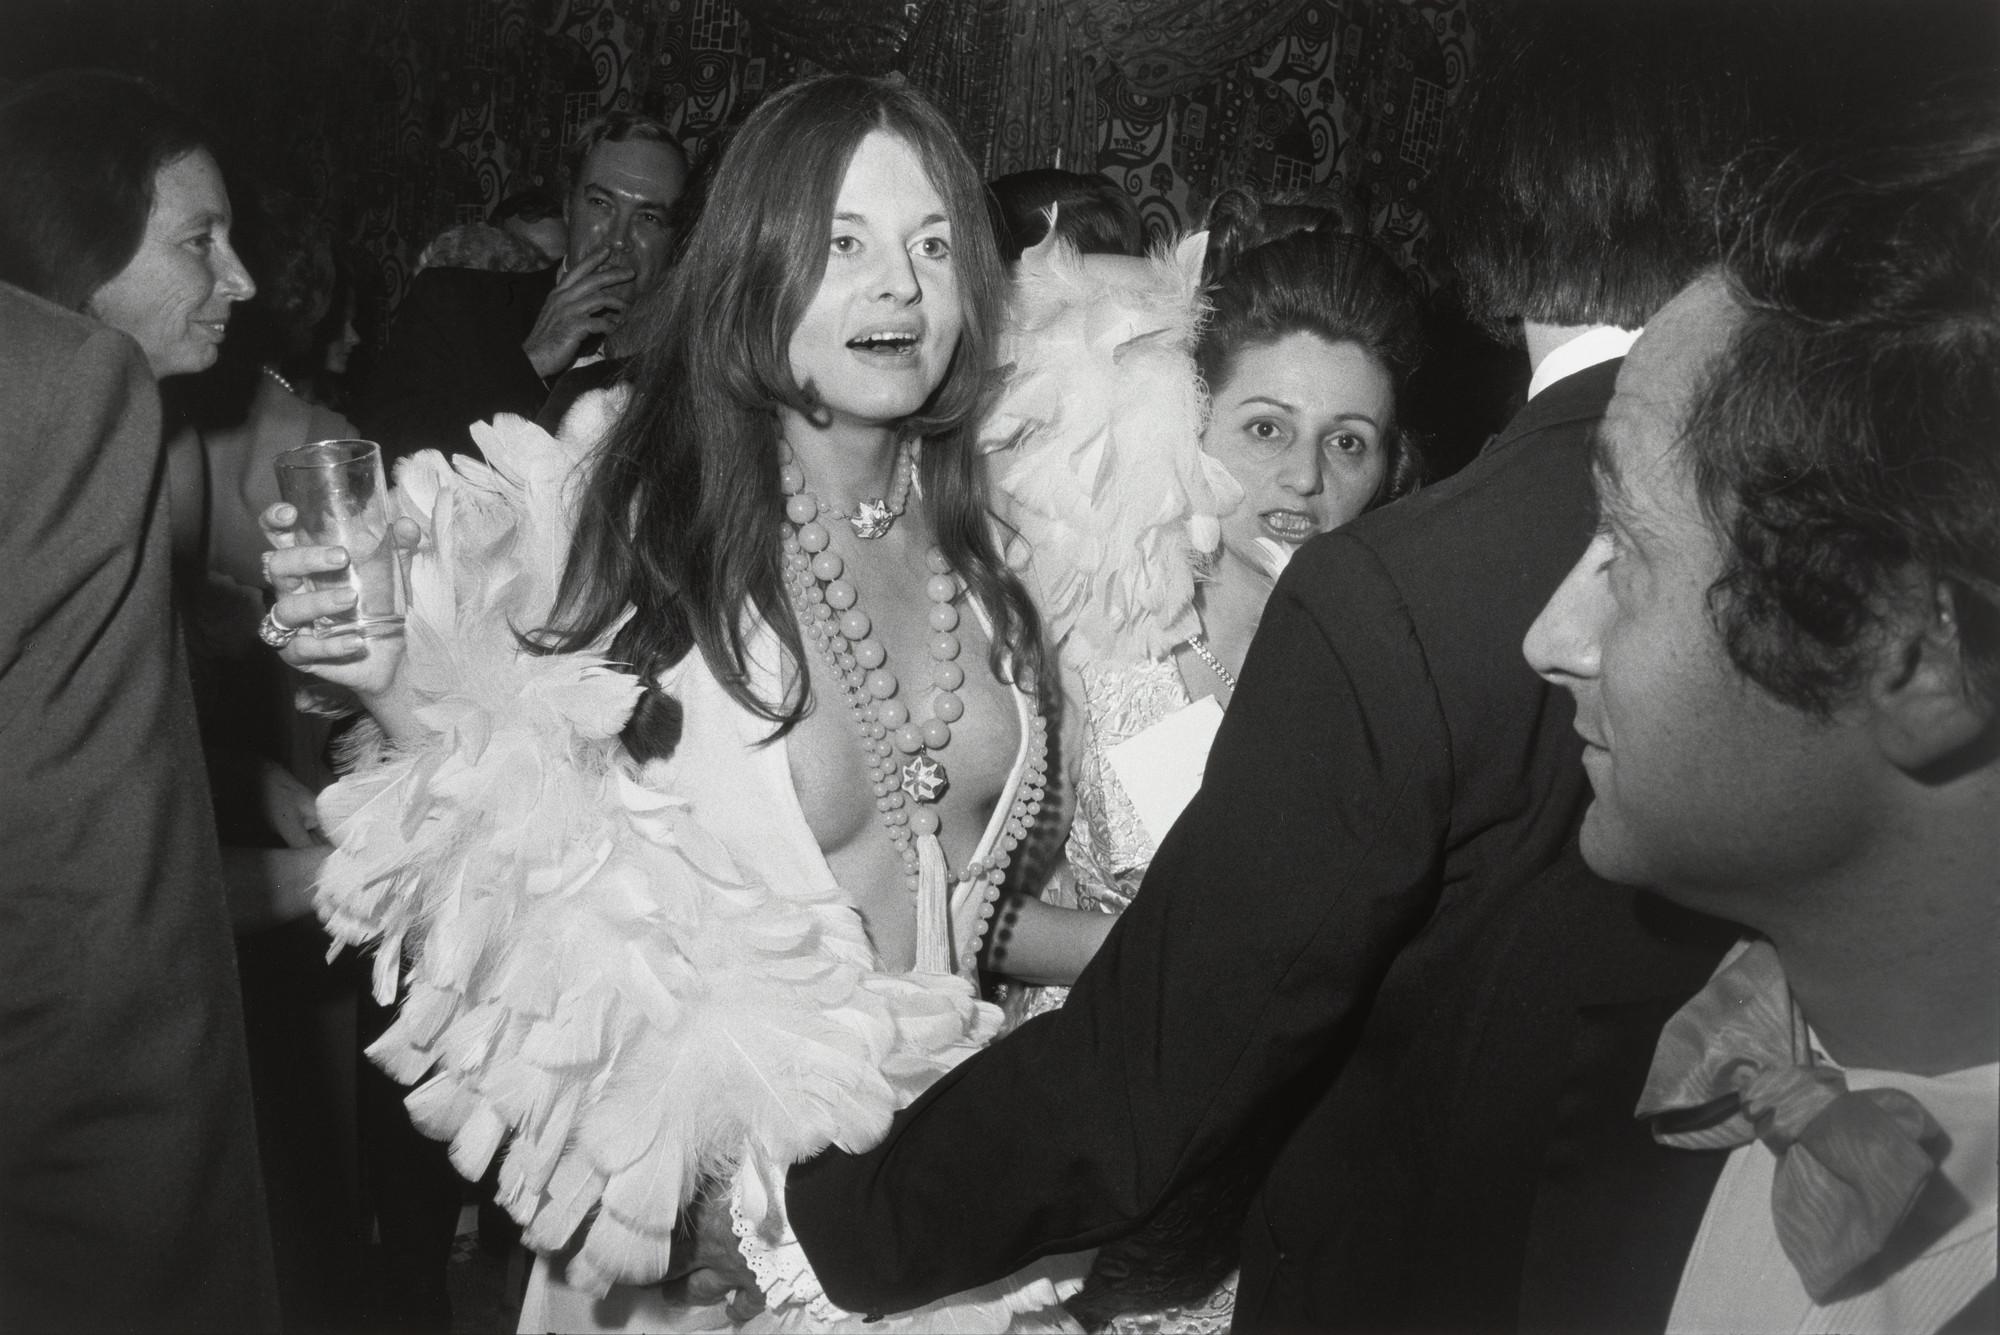 Garry Winogrand. Centennial Ball, Metropolitan Museum of Art, New York from Women are Beautiful. 1969 | MoMA